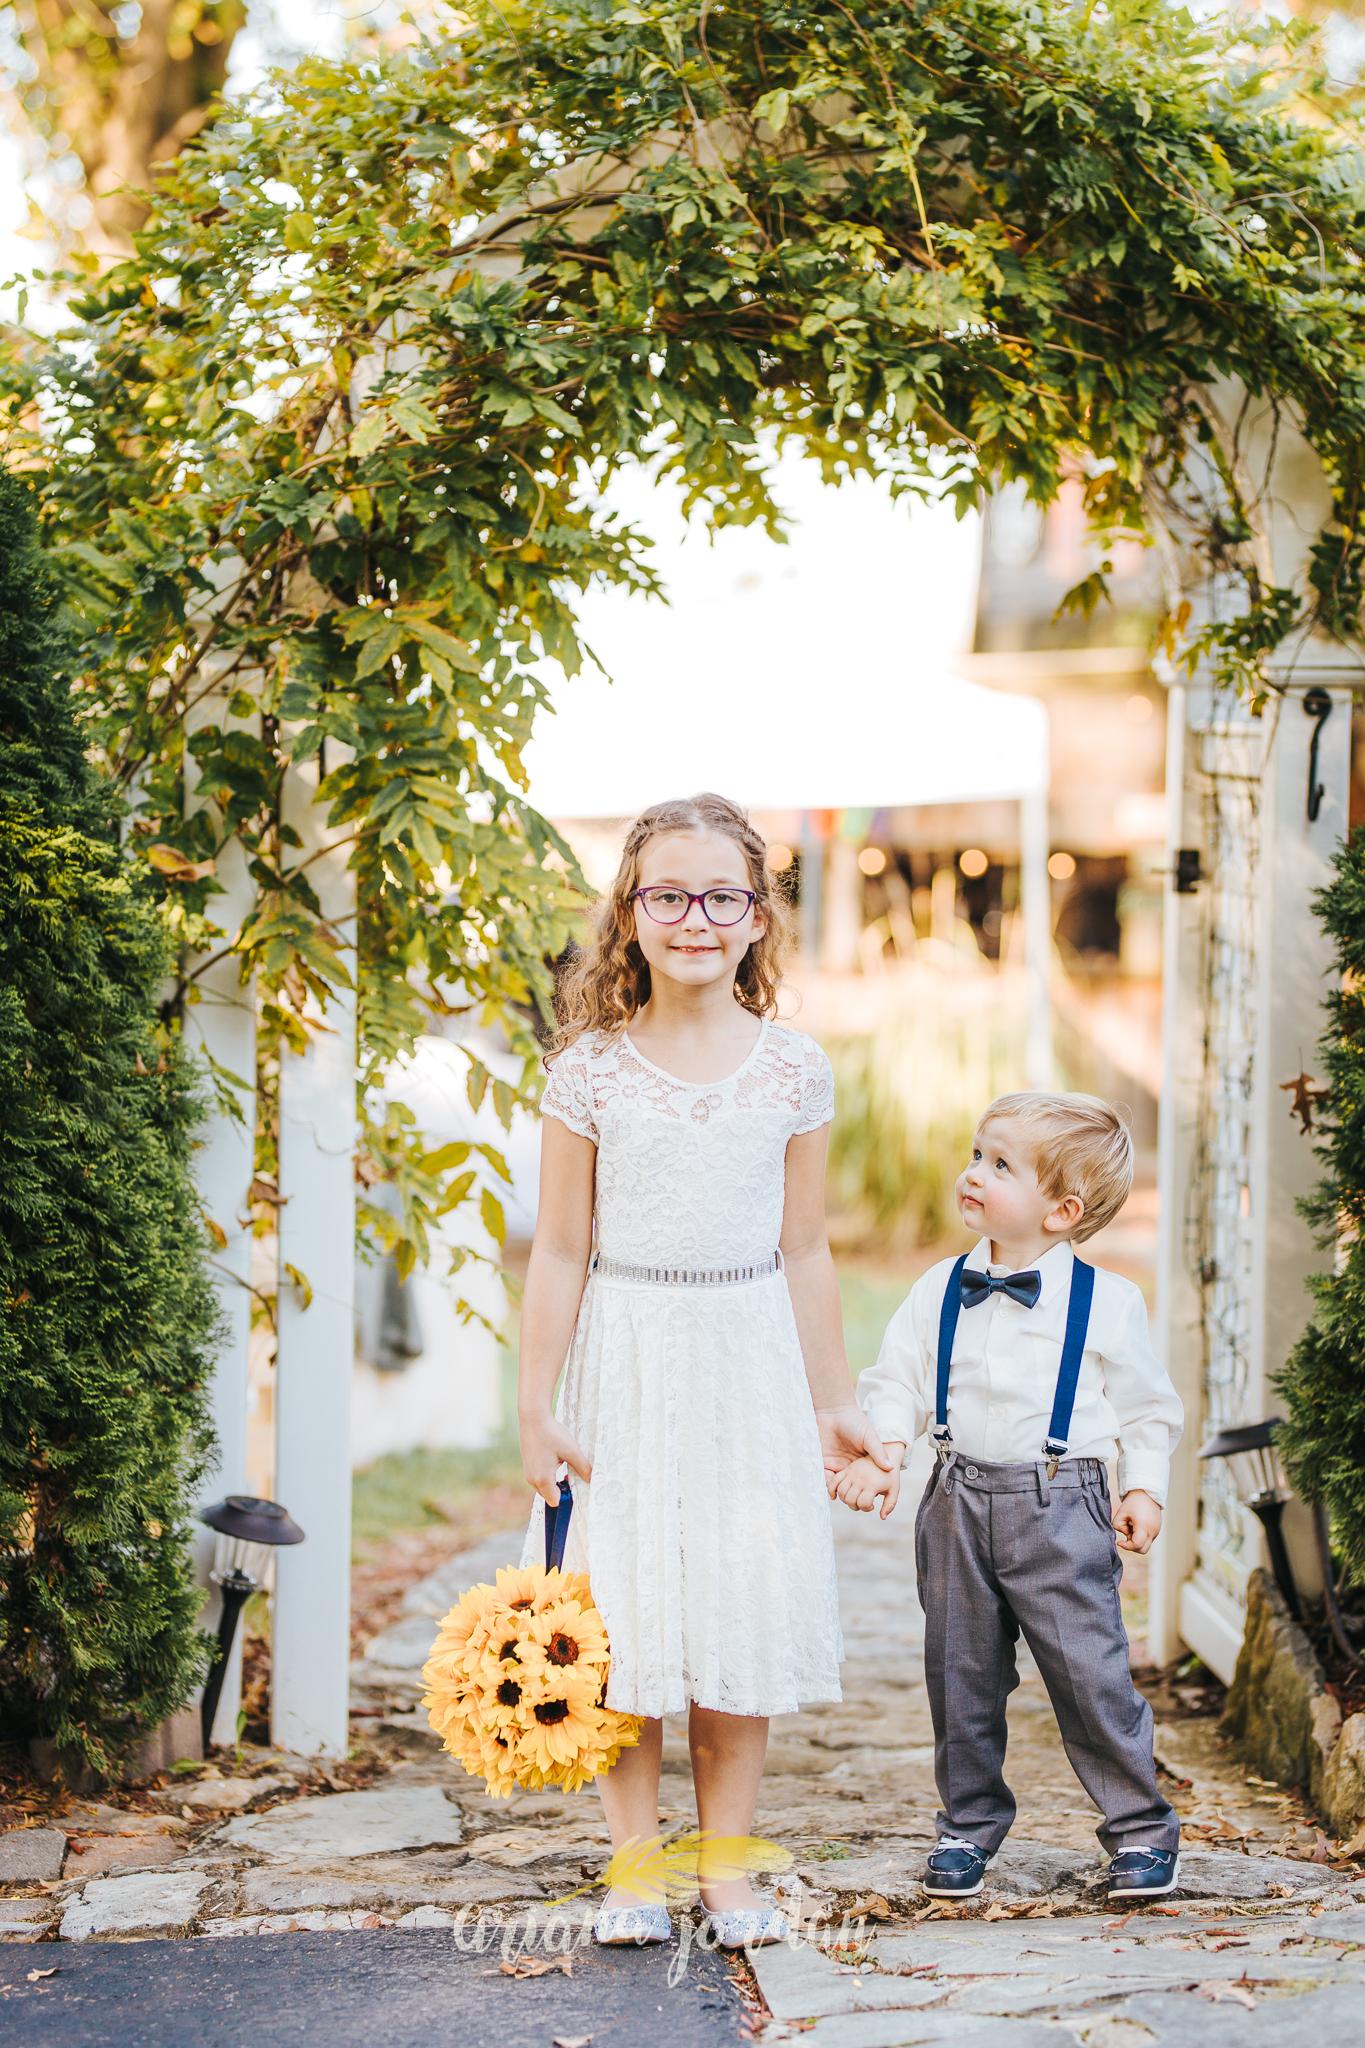 086 Ariana Jordan Photography -Moonlight Fields Lexington Ky Wedding Photographer 4753.jpg